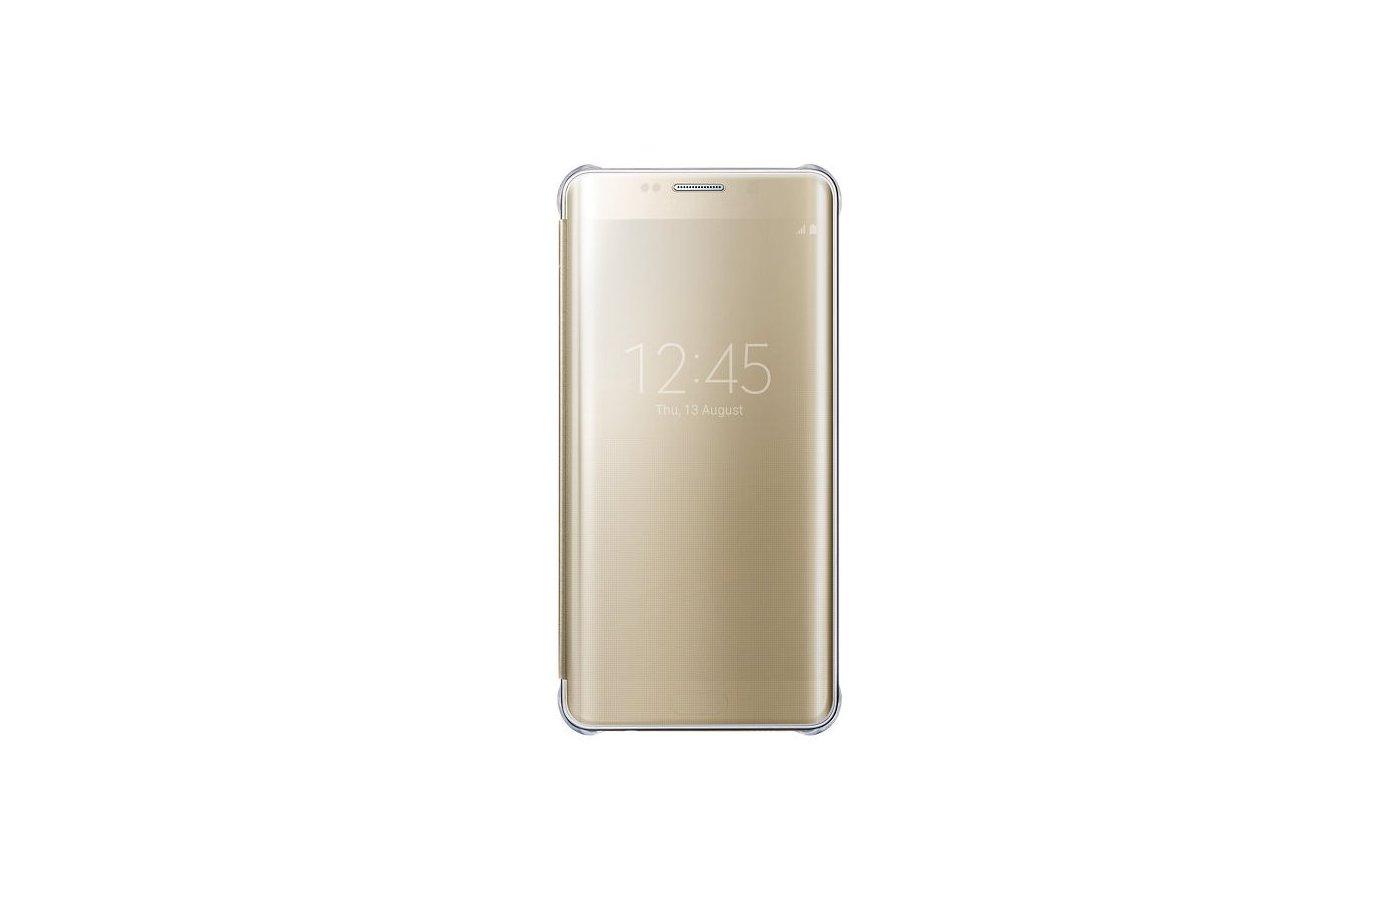 Чехол Samsung ClVCover для Galaxy S6 Edge+ (SM-G928) (EF-ZG928CFEGRU) gold